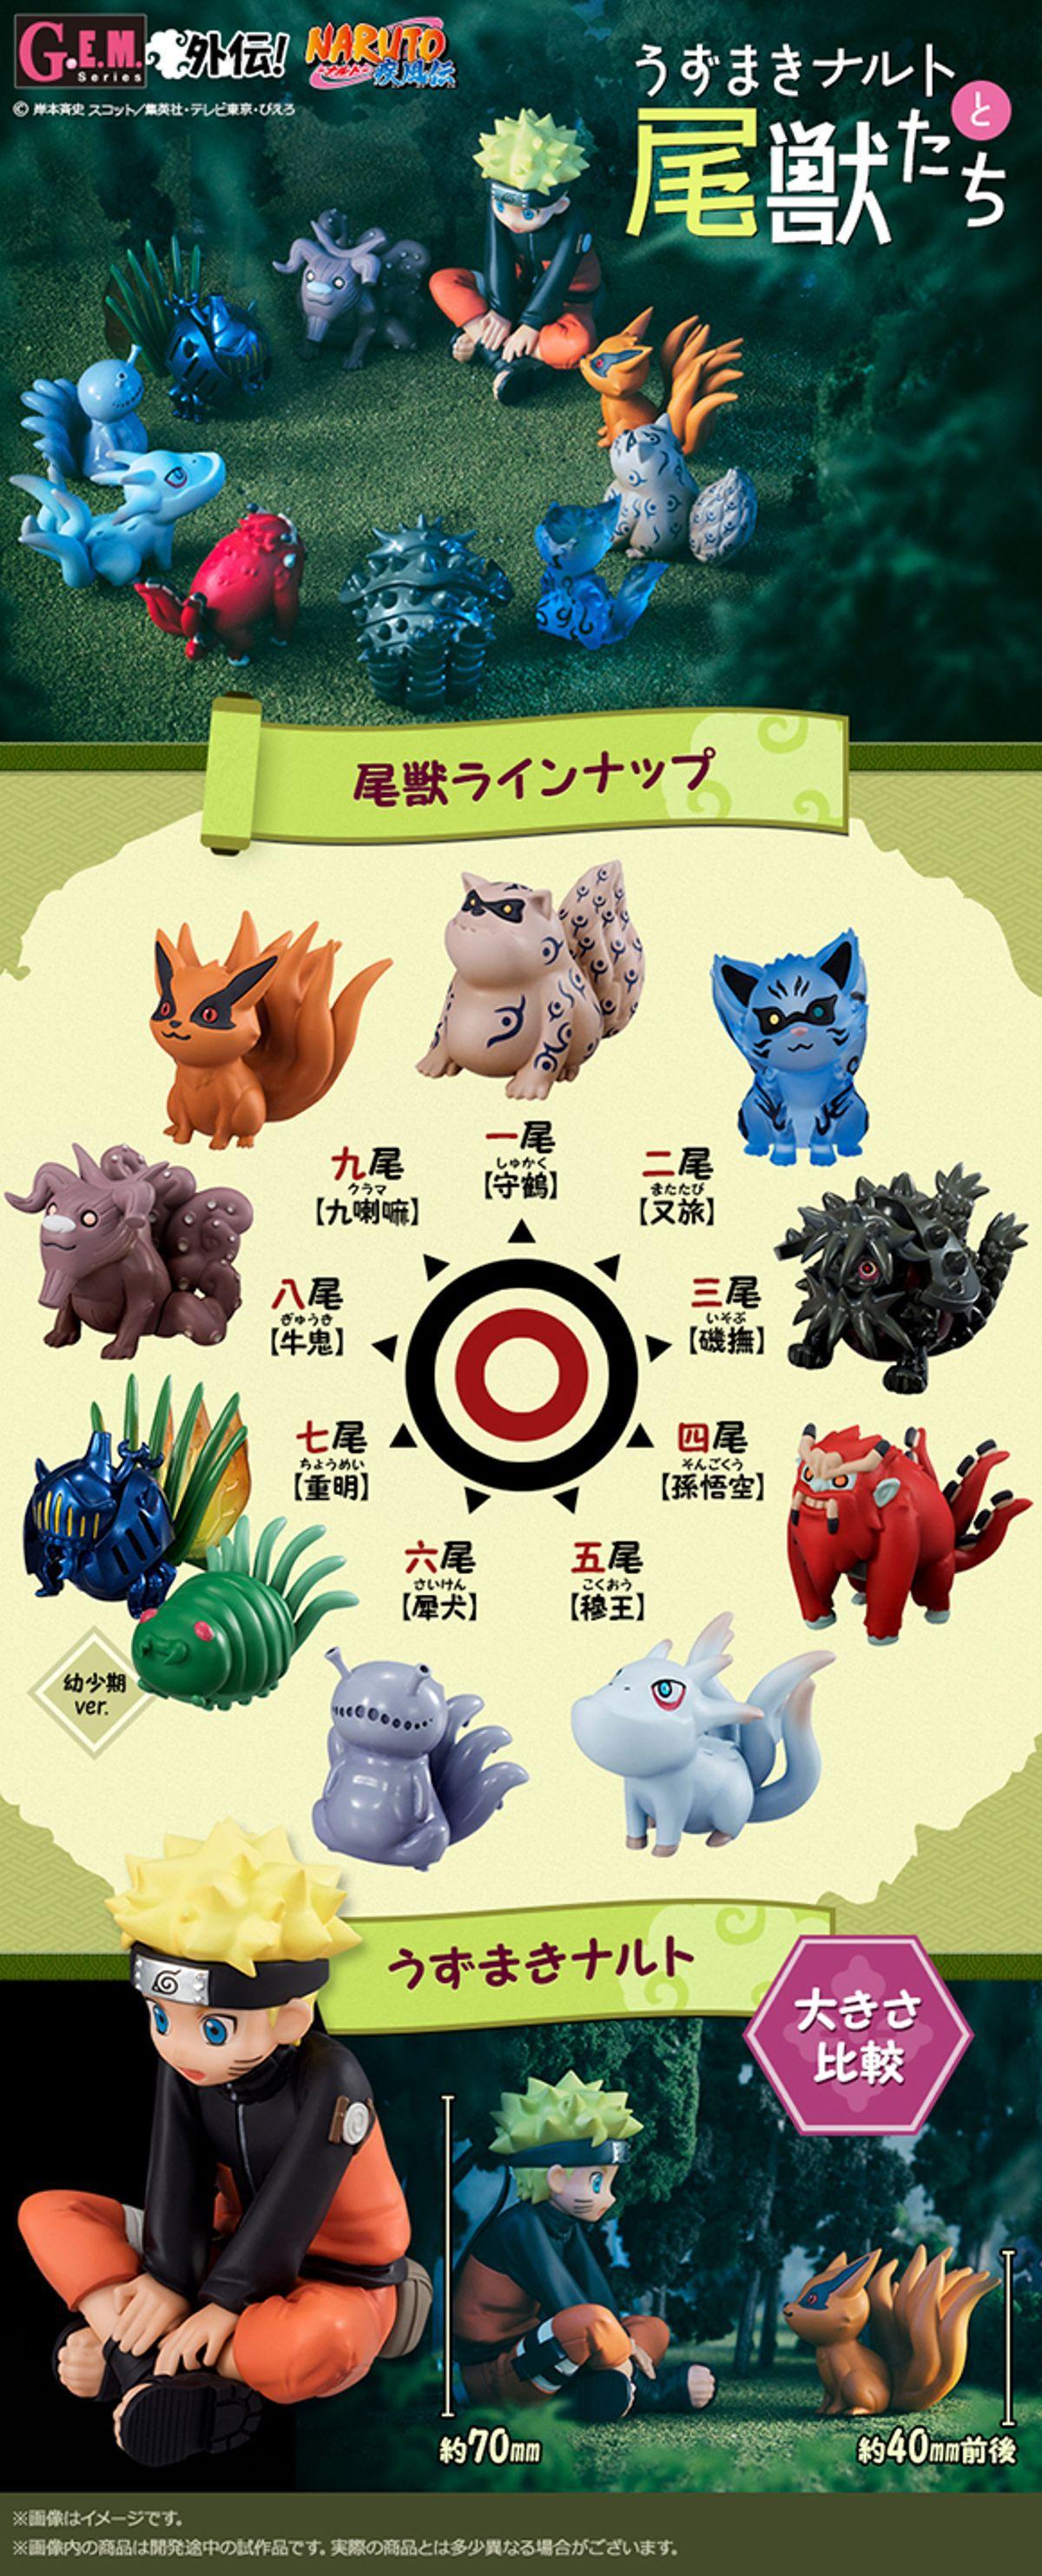 Naruto - Naruto Uzumaki and 9 Tailed Beasts Bijuu 11pcs/lot Action Figure (4-7cm)